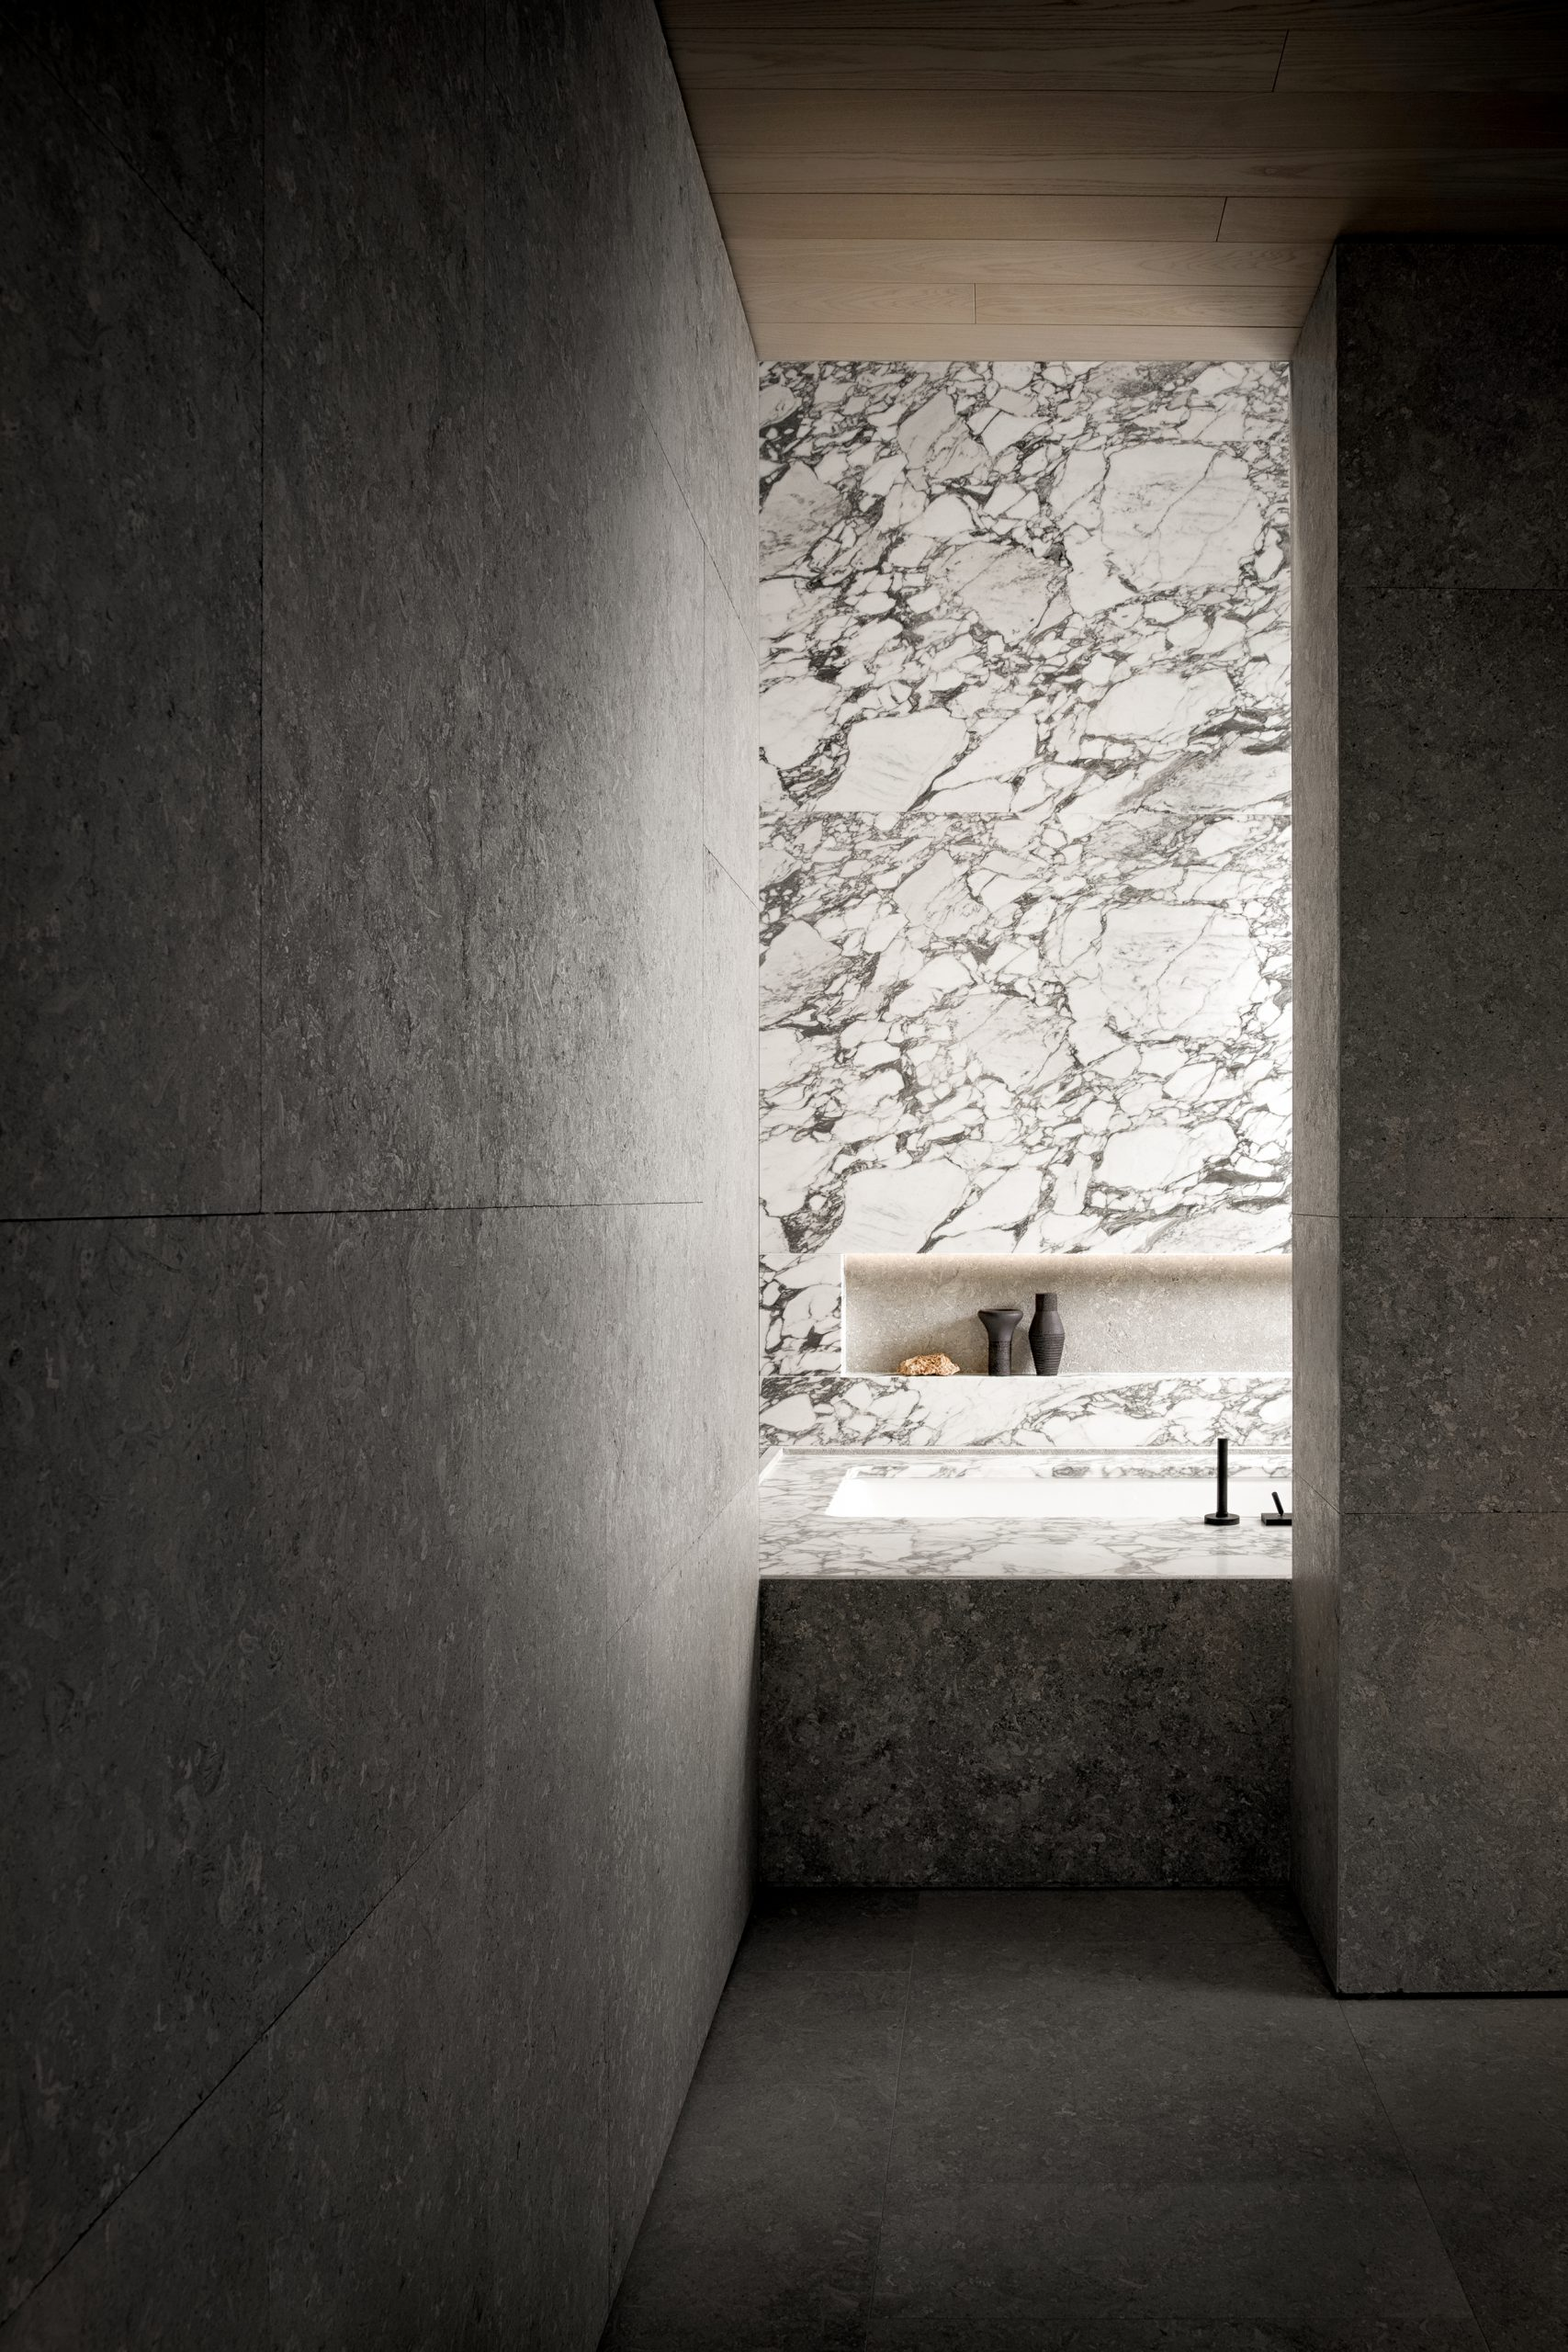 Detail of Showroom Interior Design by Debiasi Sandri for Grassi Pietre